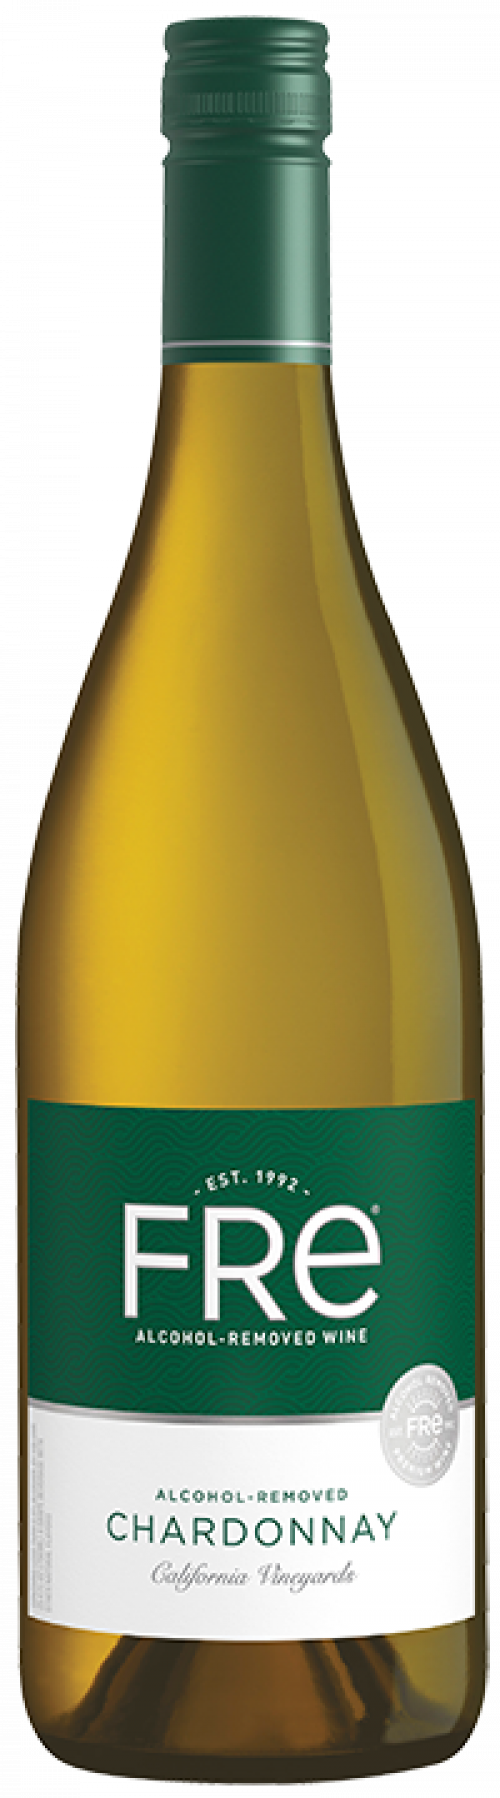 Sutter Home Fre Chardonnay 750ml NV